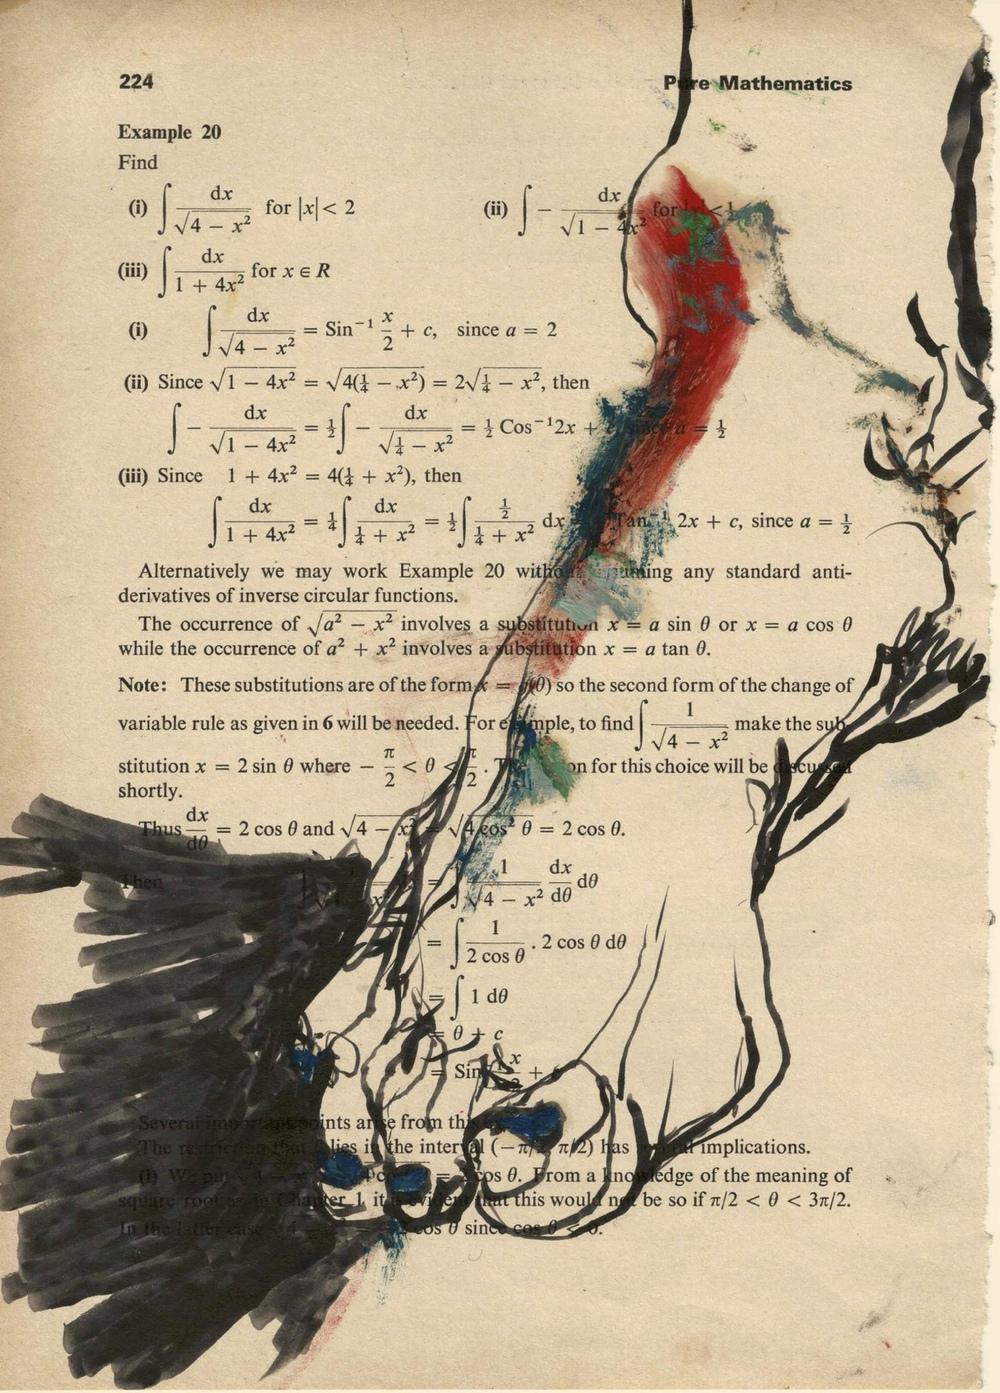 Ariel Navas - Wesleys Foot (2013) Oil and marker on paper